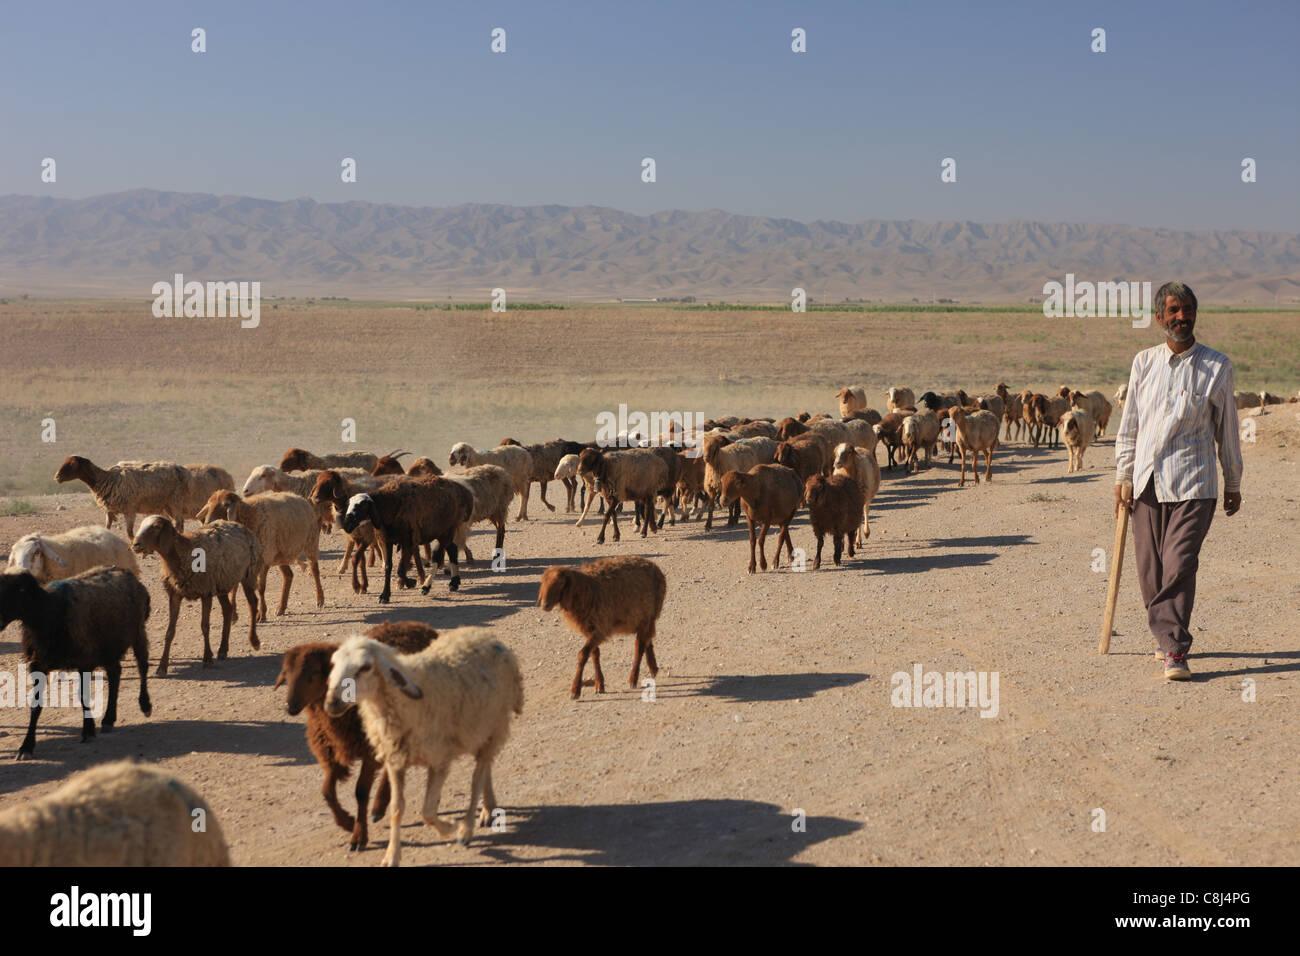 herd, flock, drove flocks. sheep, lamp, shepherd, animals, livestock, pasturage, Iran, silk road, man, on the way, - Stock Image